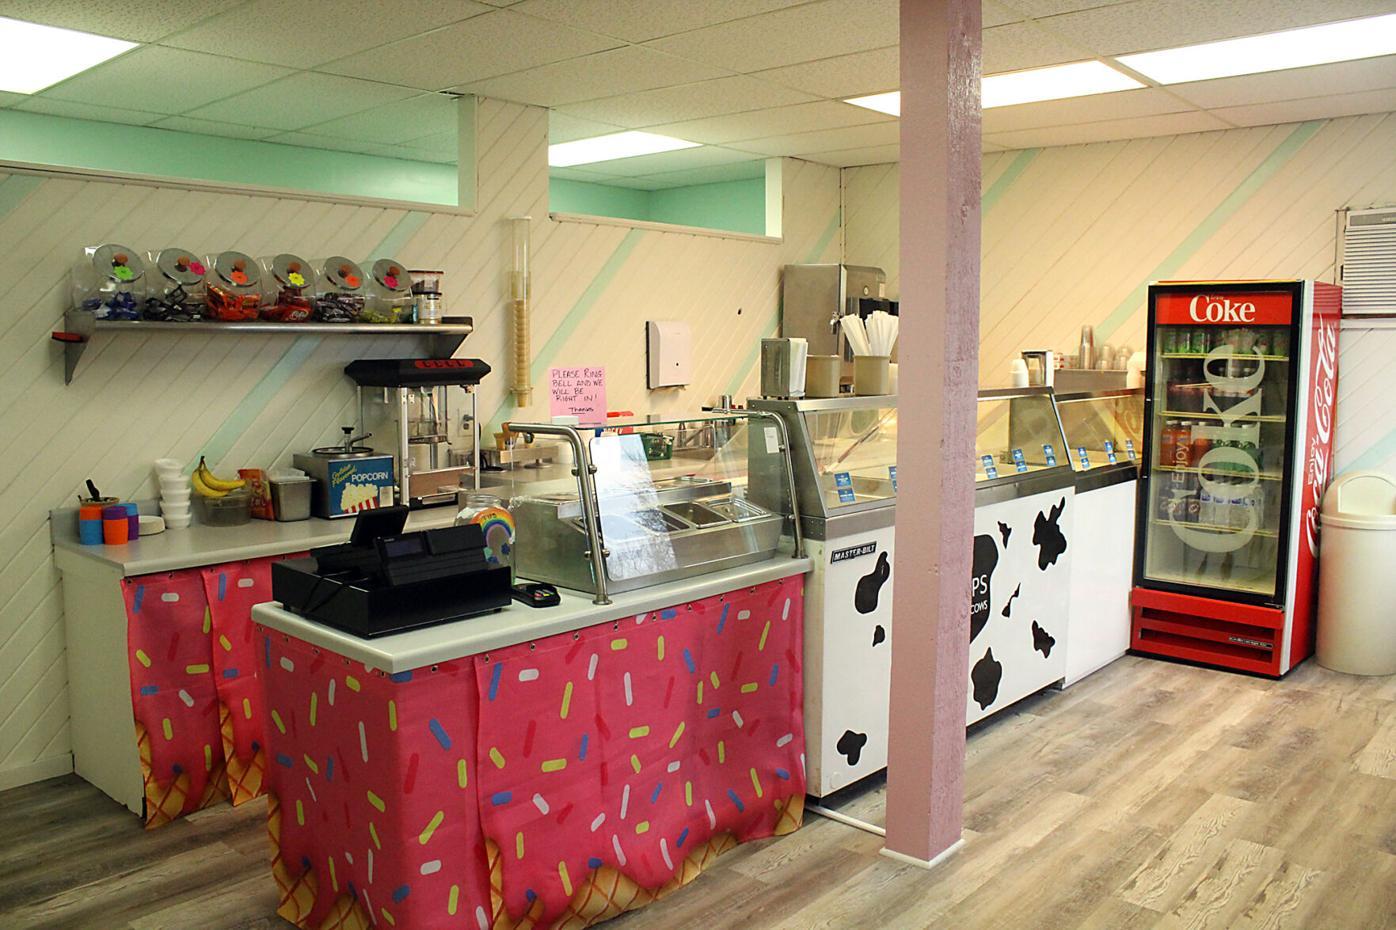 Ice cream parlor renovated